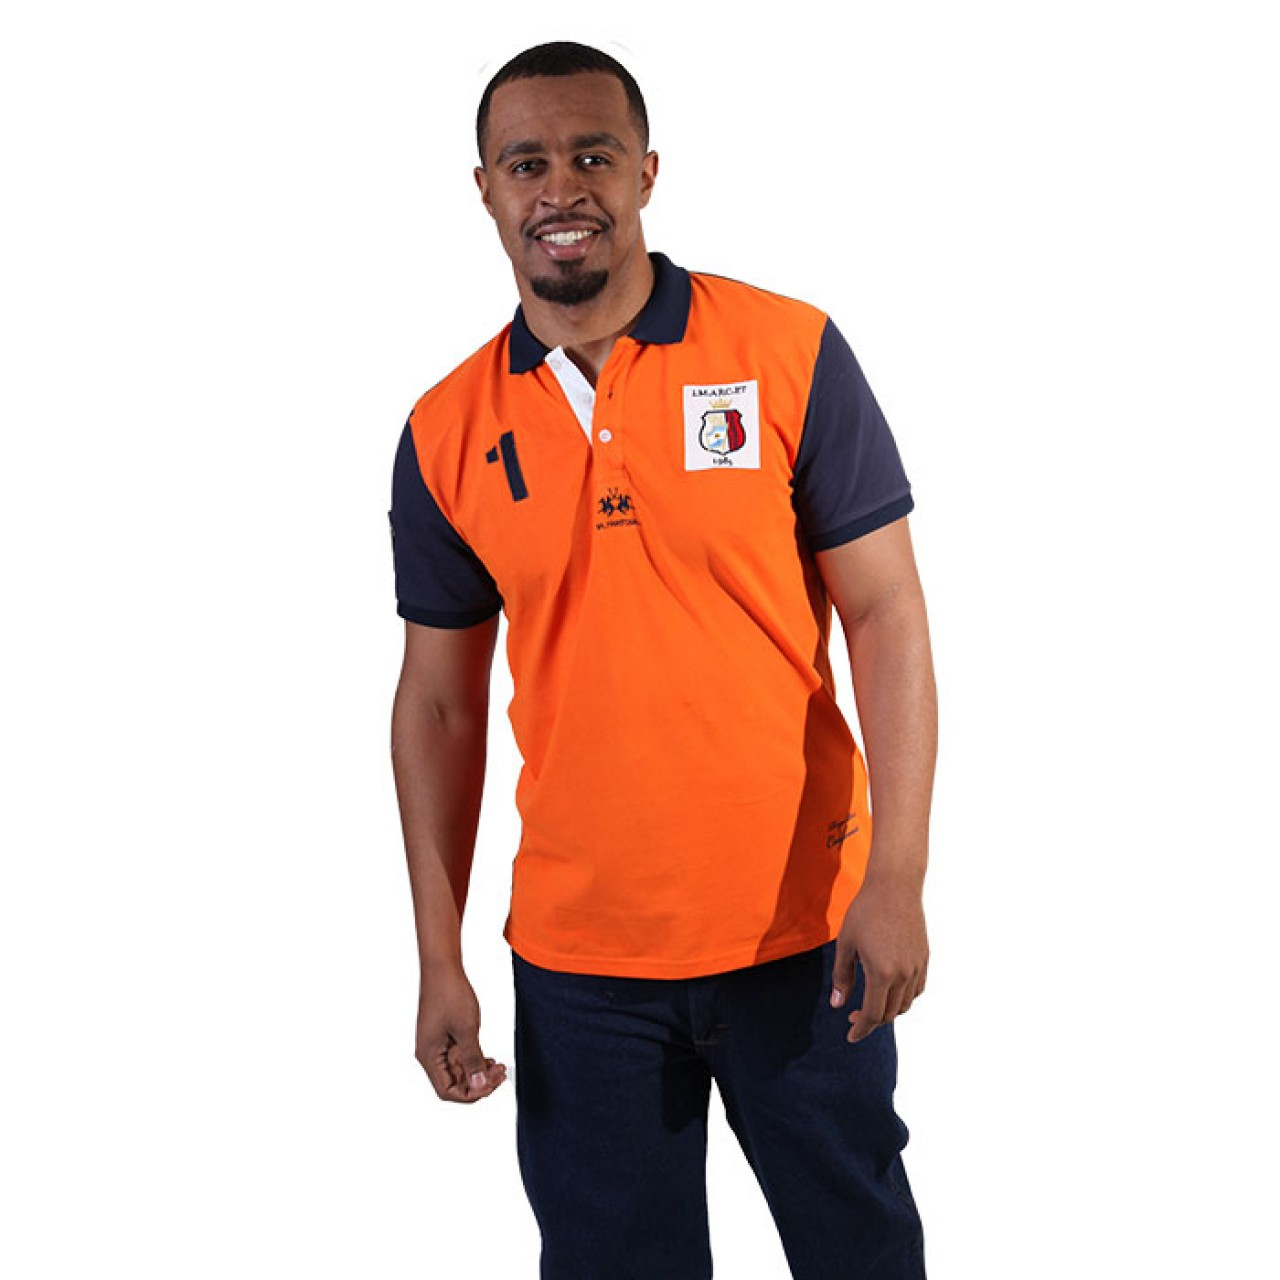 Men's Basic Fit Orange Collared Neck Tees